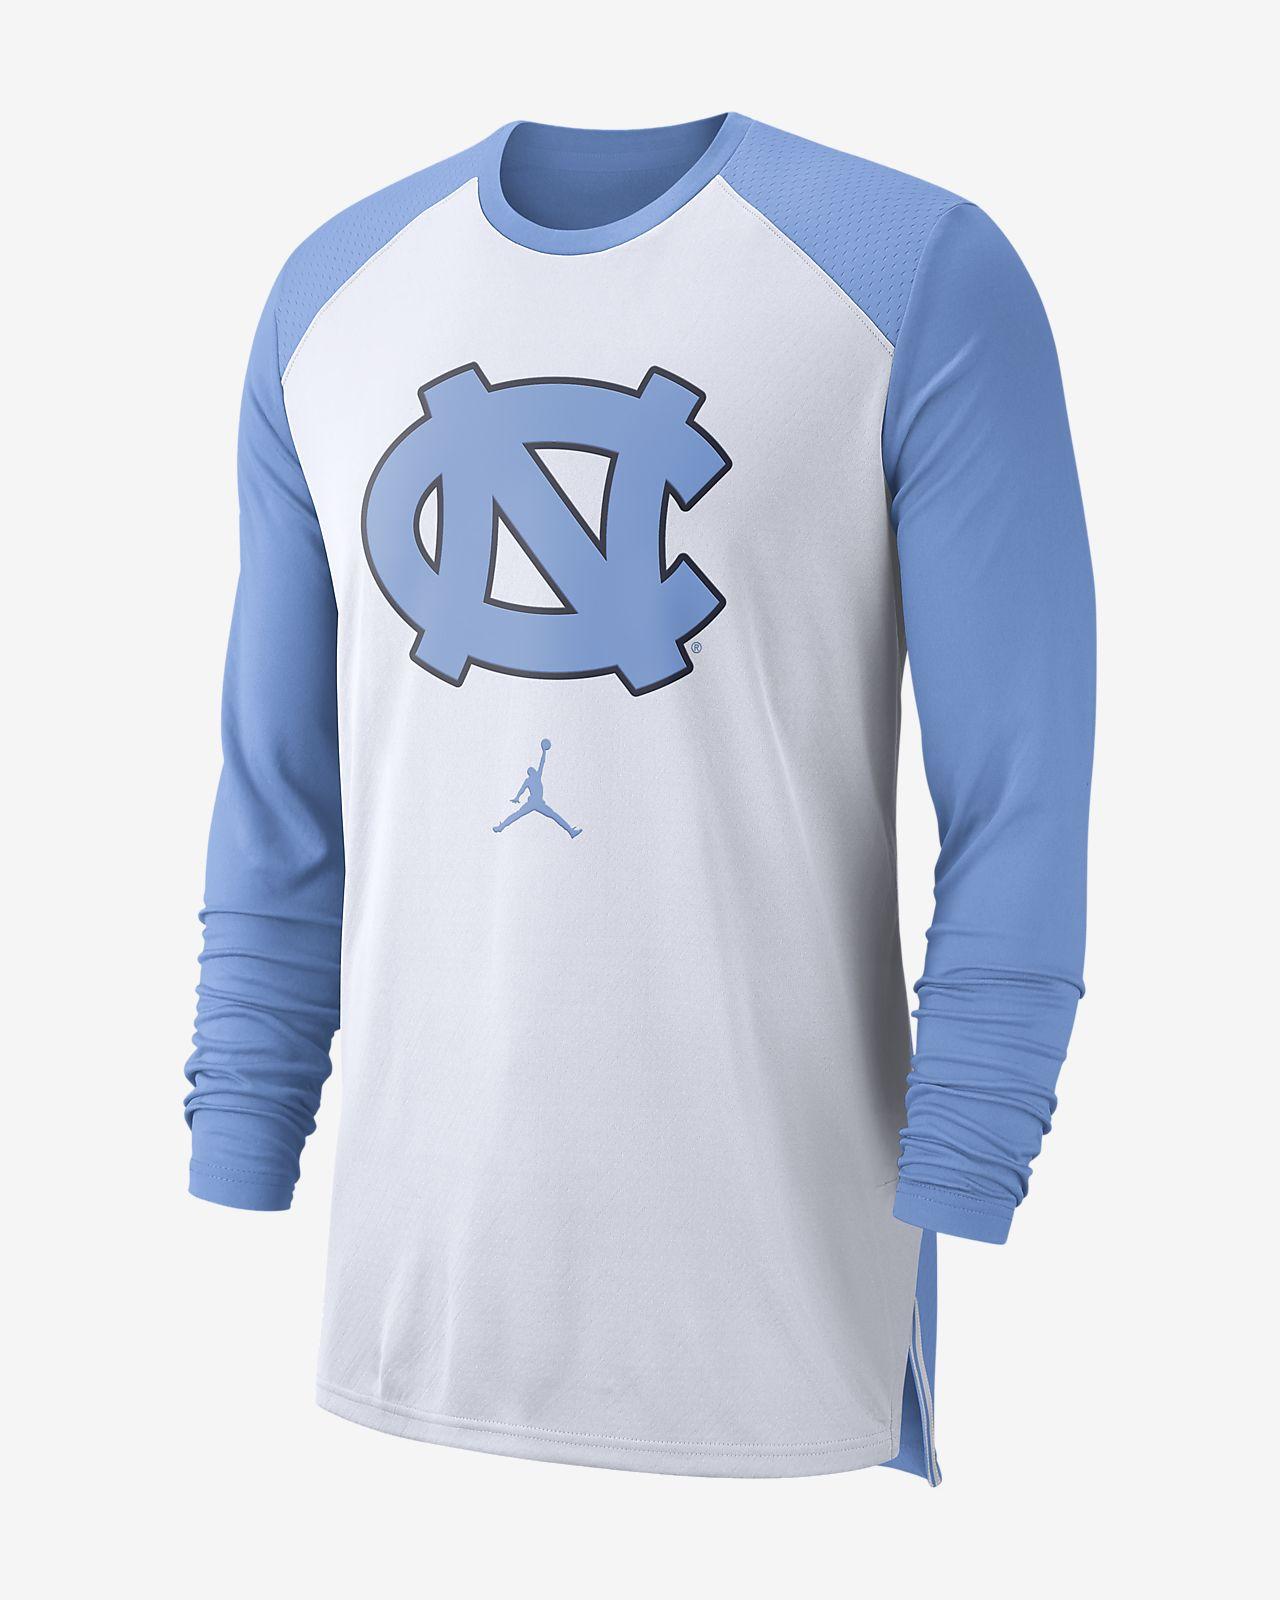 Jordan College Breathe (North Carolina) Men's Long-Sleeve Top